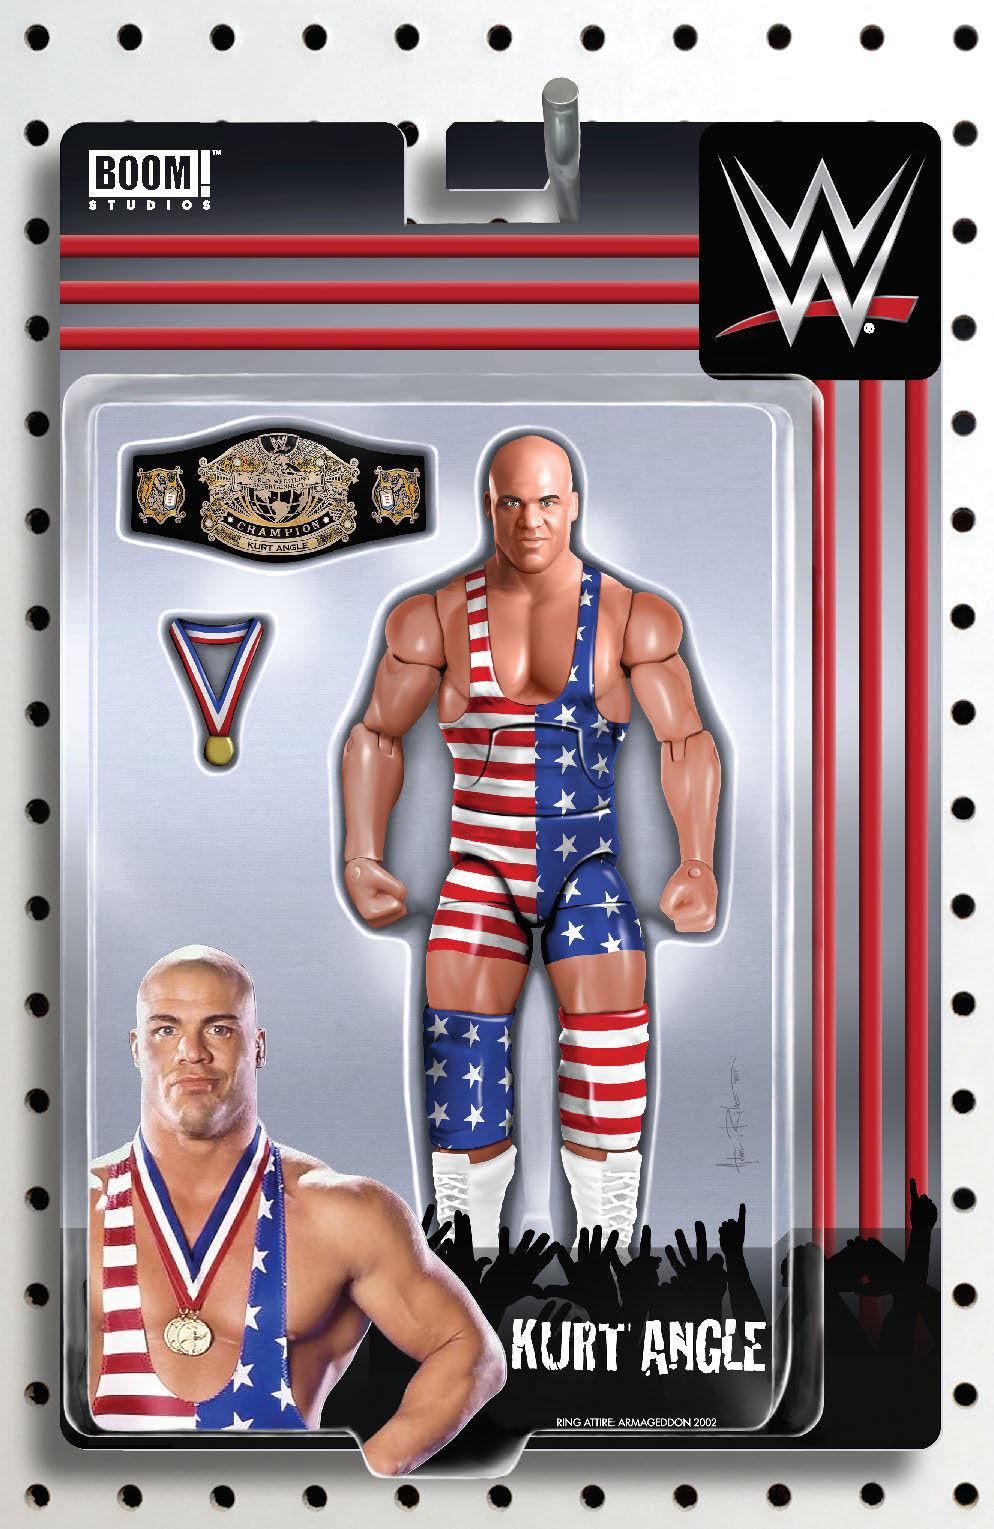 WWE_013_Cover_B_ActionFigure.jpg